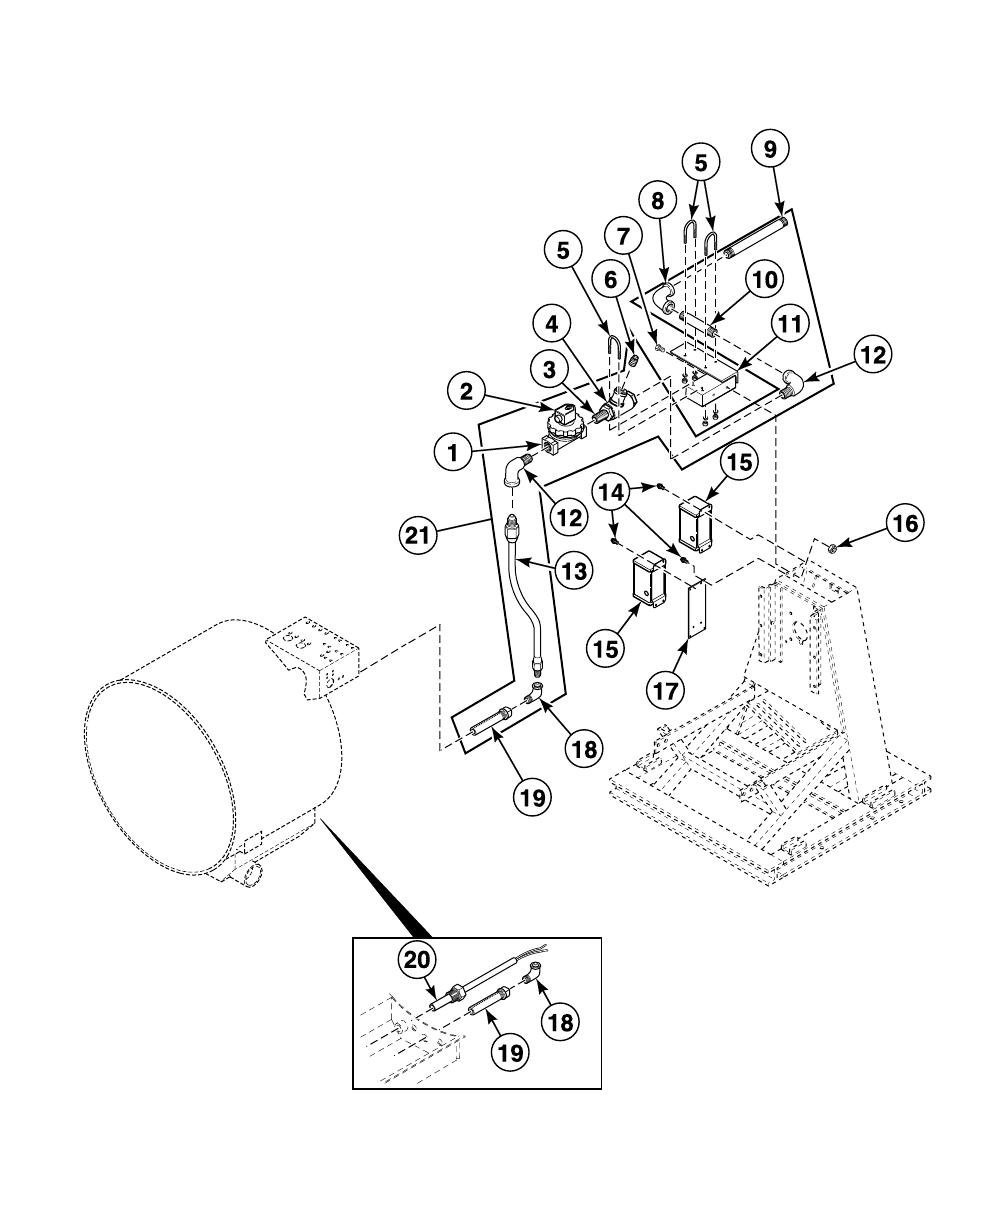 Washer Extractor Parts Manual Uw125av F232184 F430 Can Bus Diagram 60